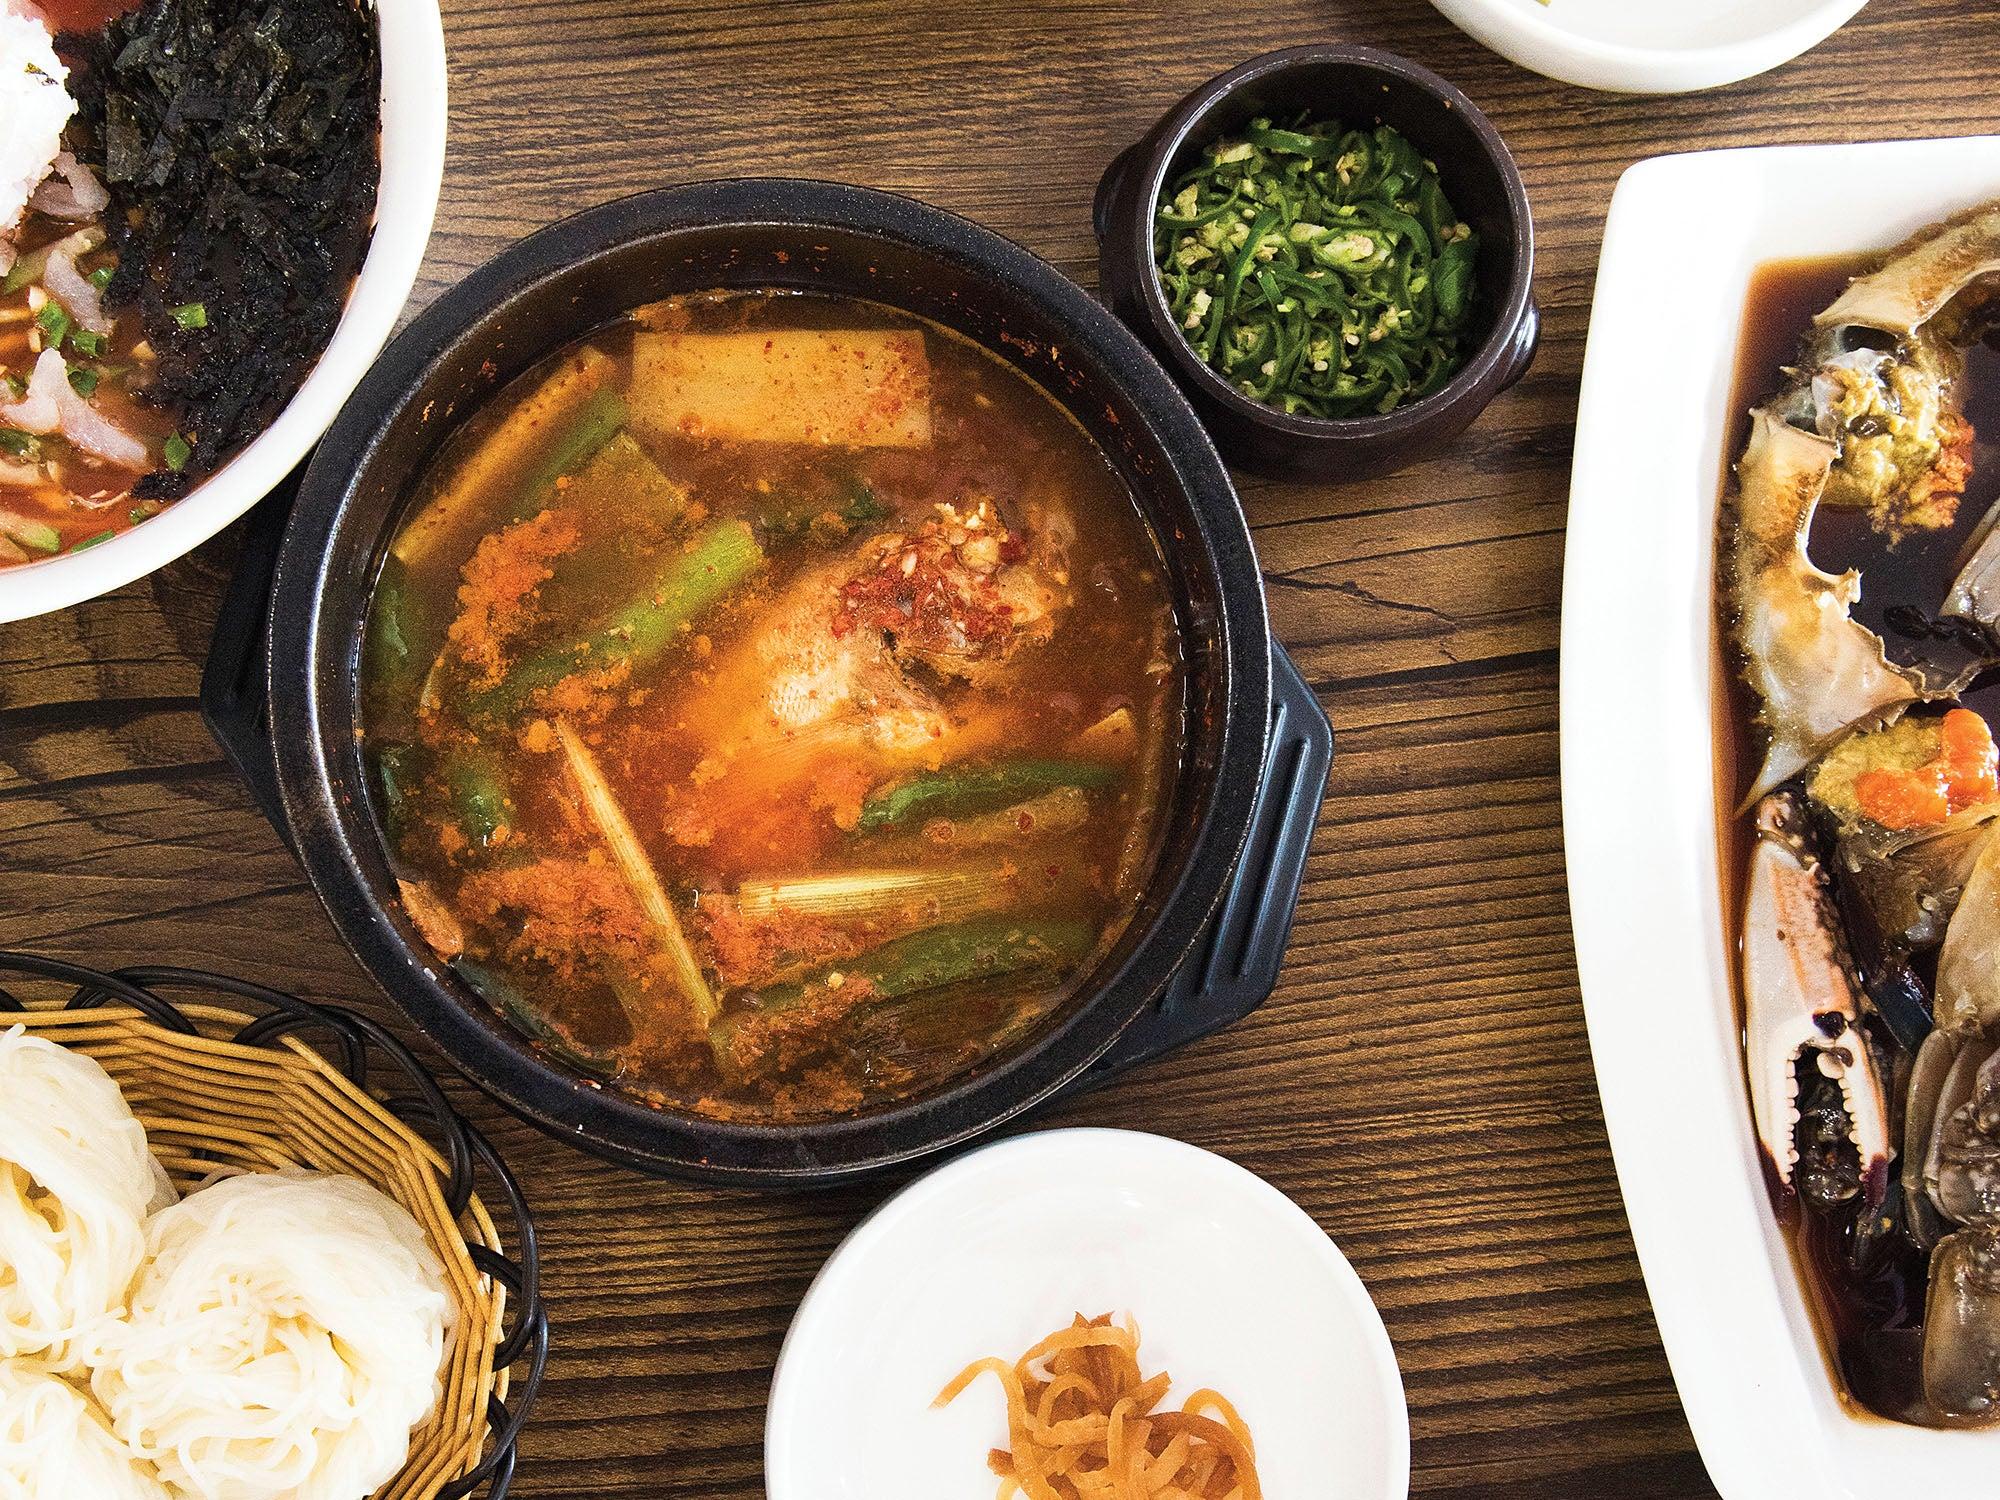 Doenjang Jjigae Korean Soybean Stew